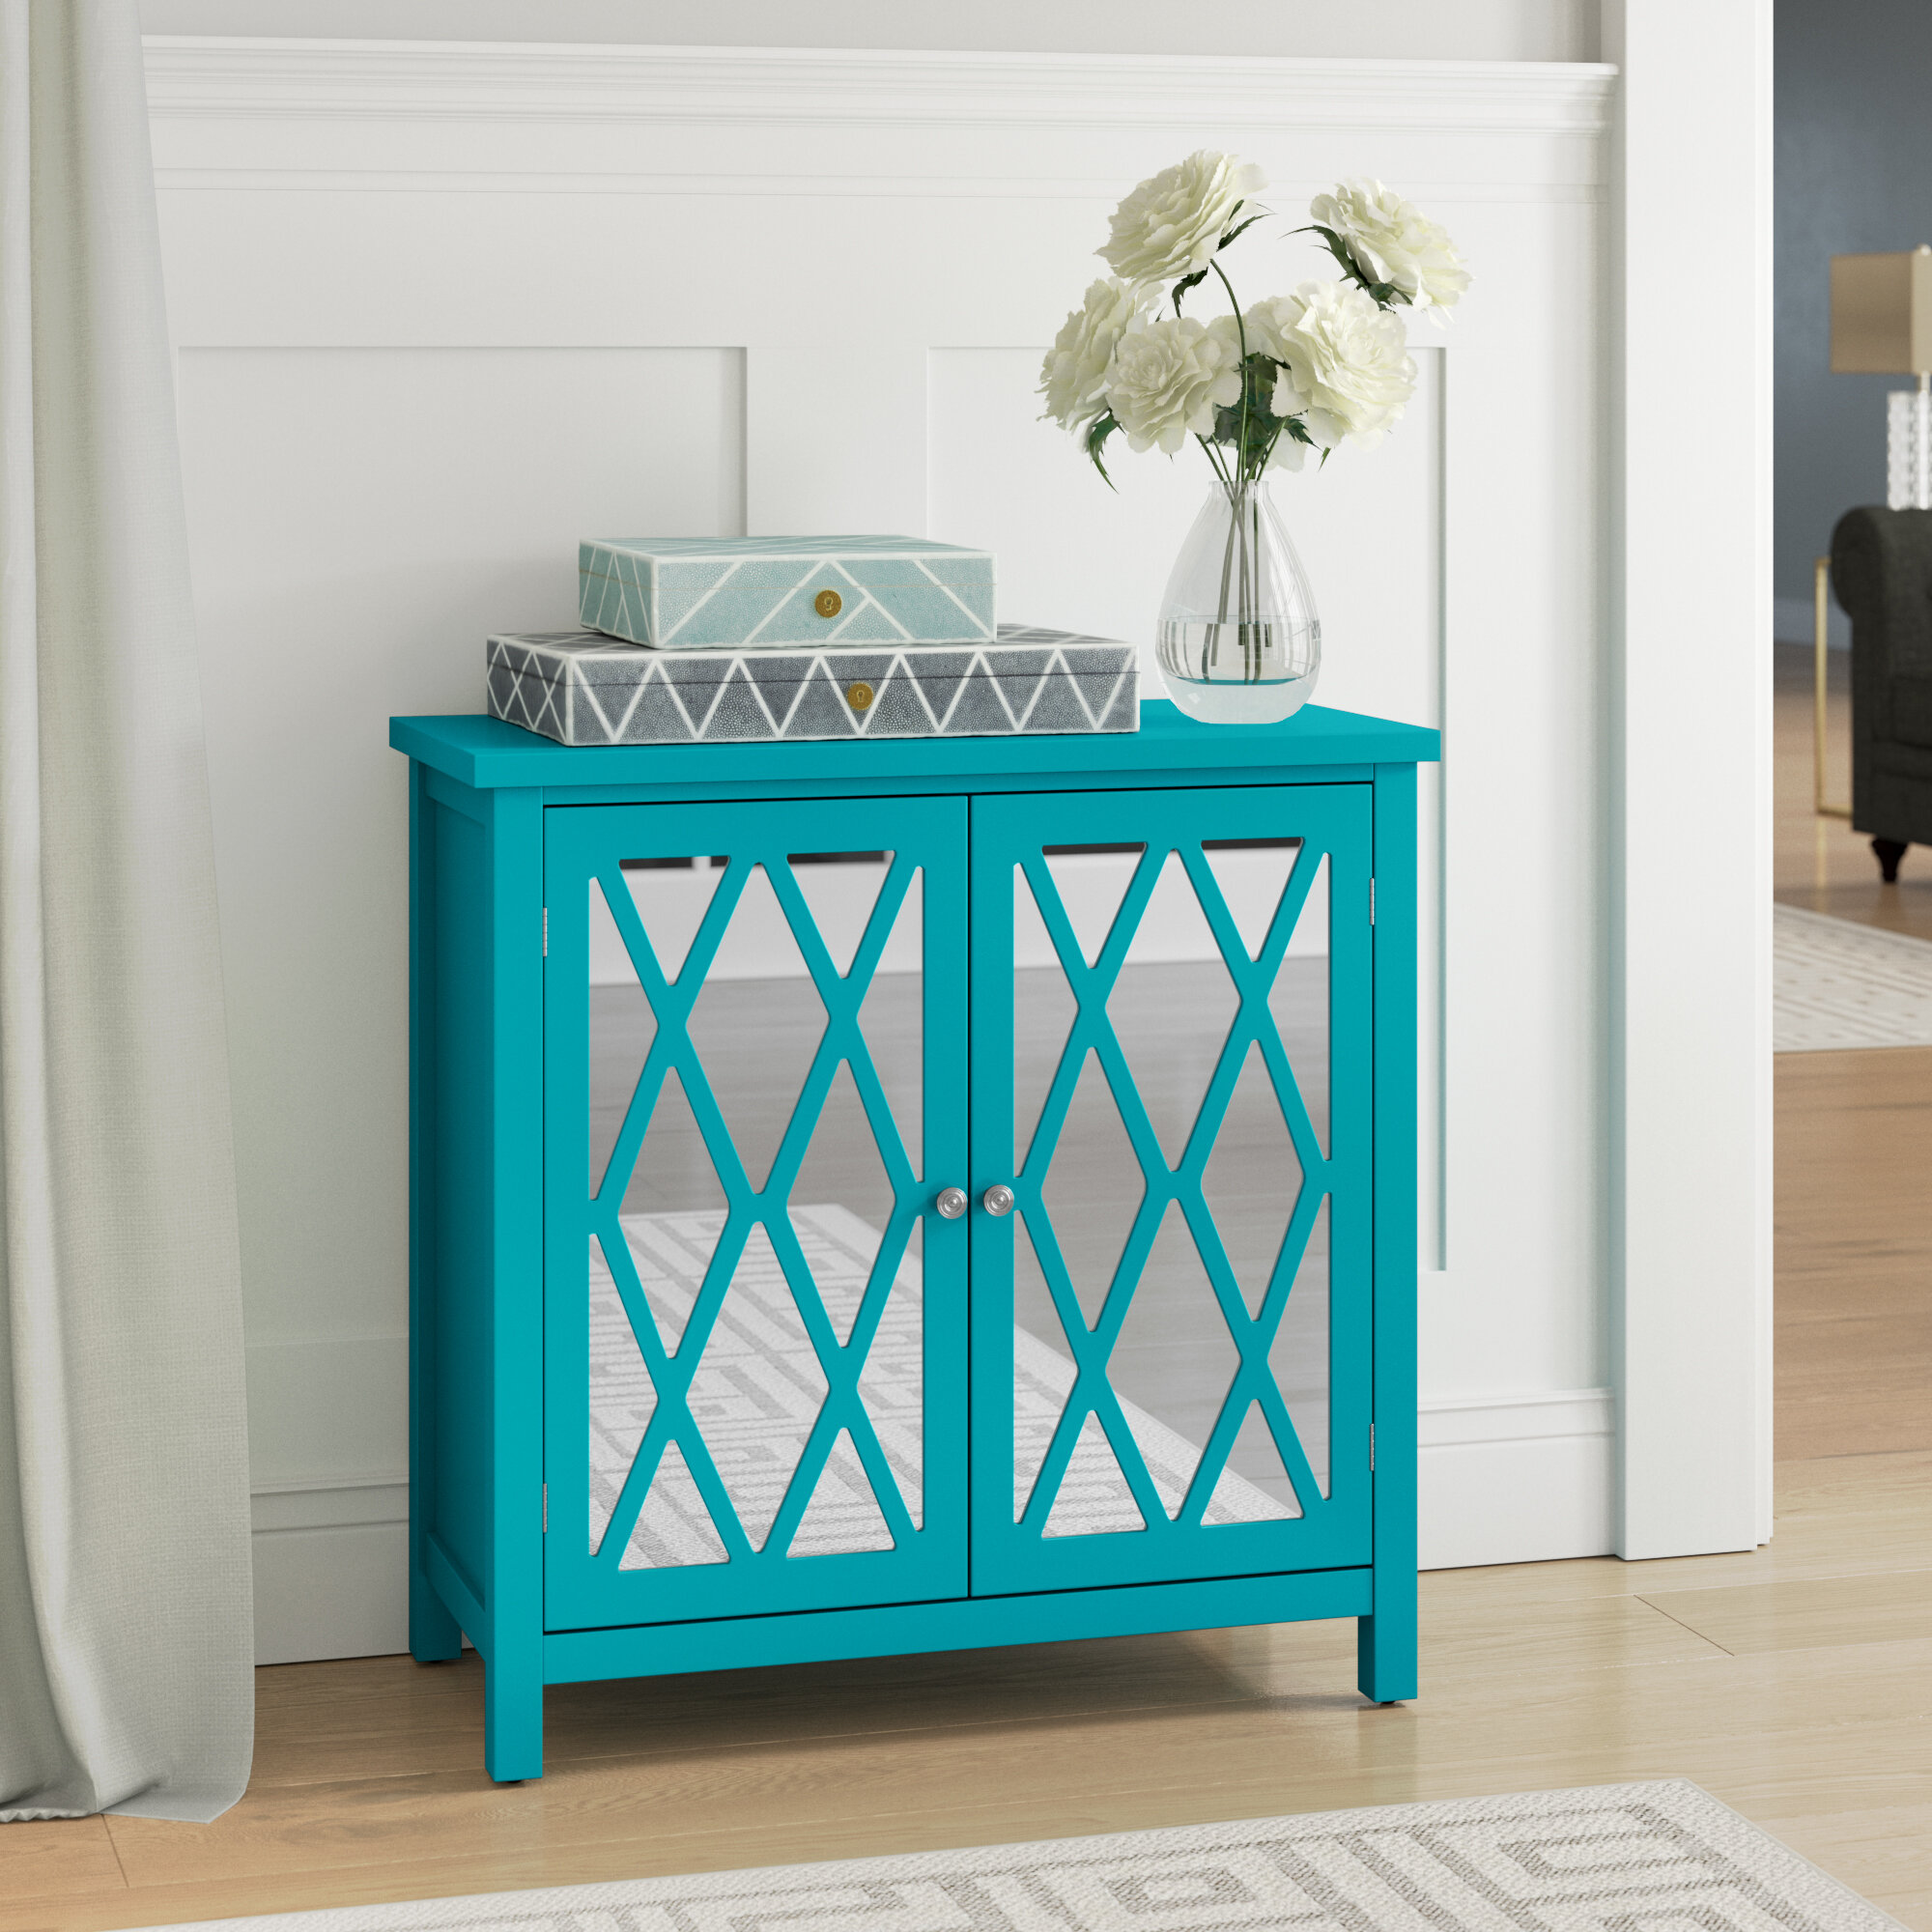 Willa Arlo Interiors Brinsmead 2 Door Accent Cabinet & Reviews | Wayfair